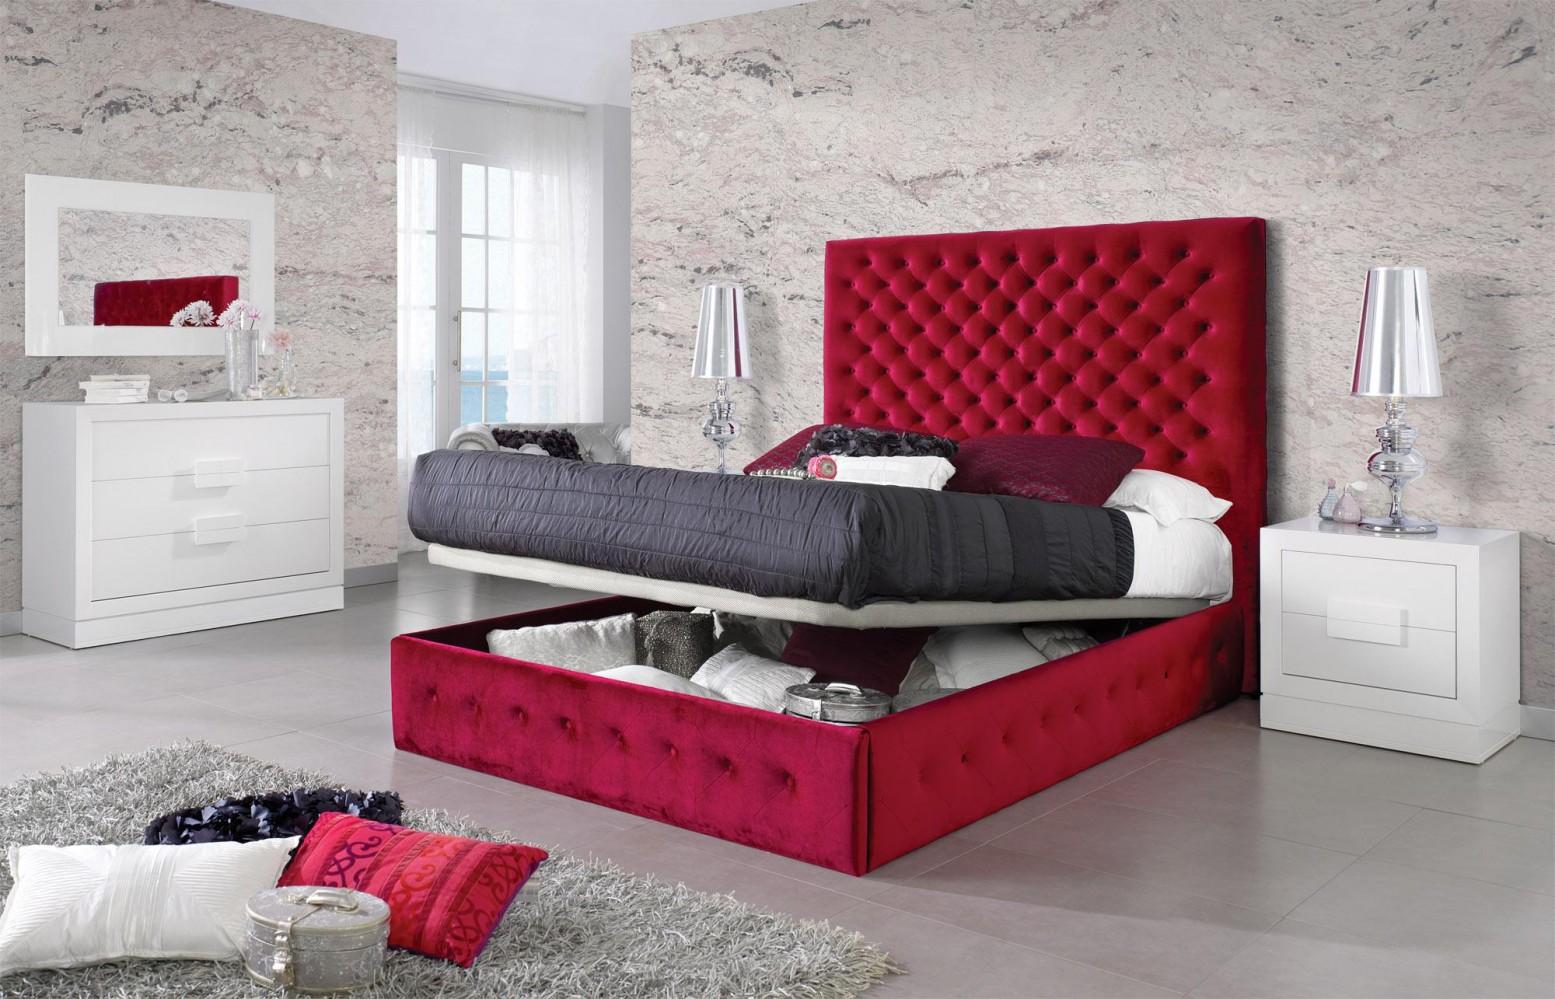 Leonor 3 Piece King Size Storage Bedroom Set Buy Online At Best Price